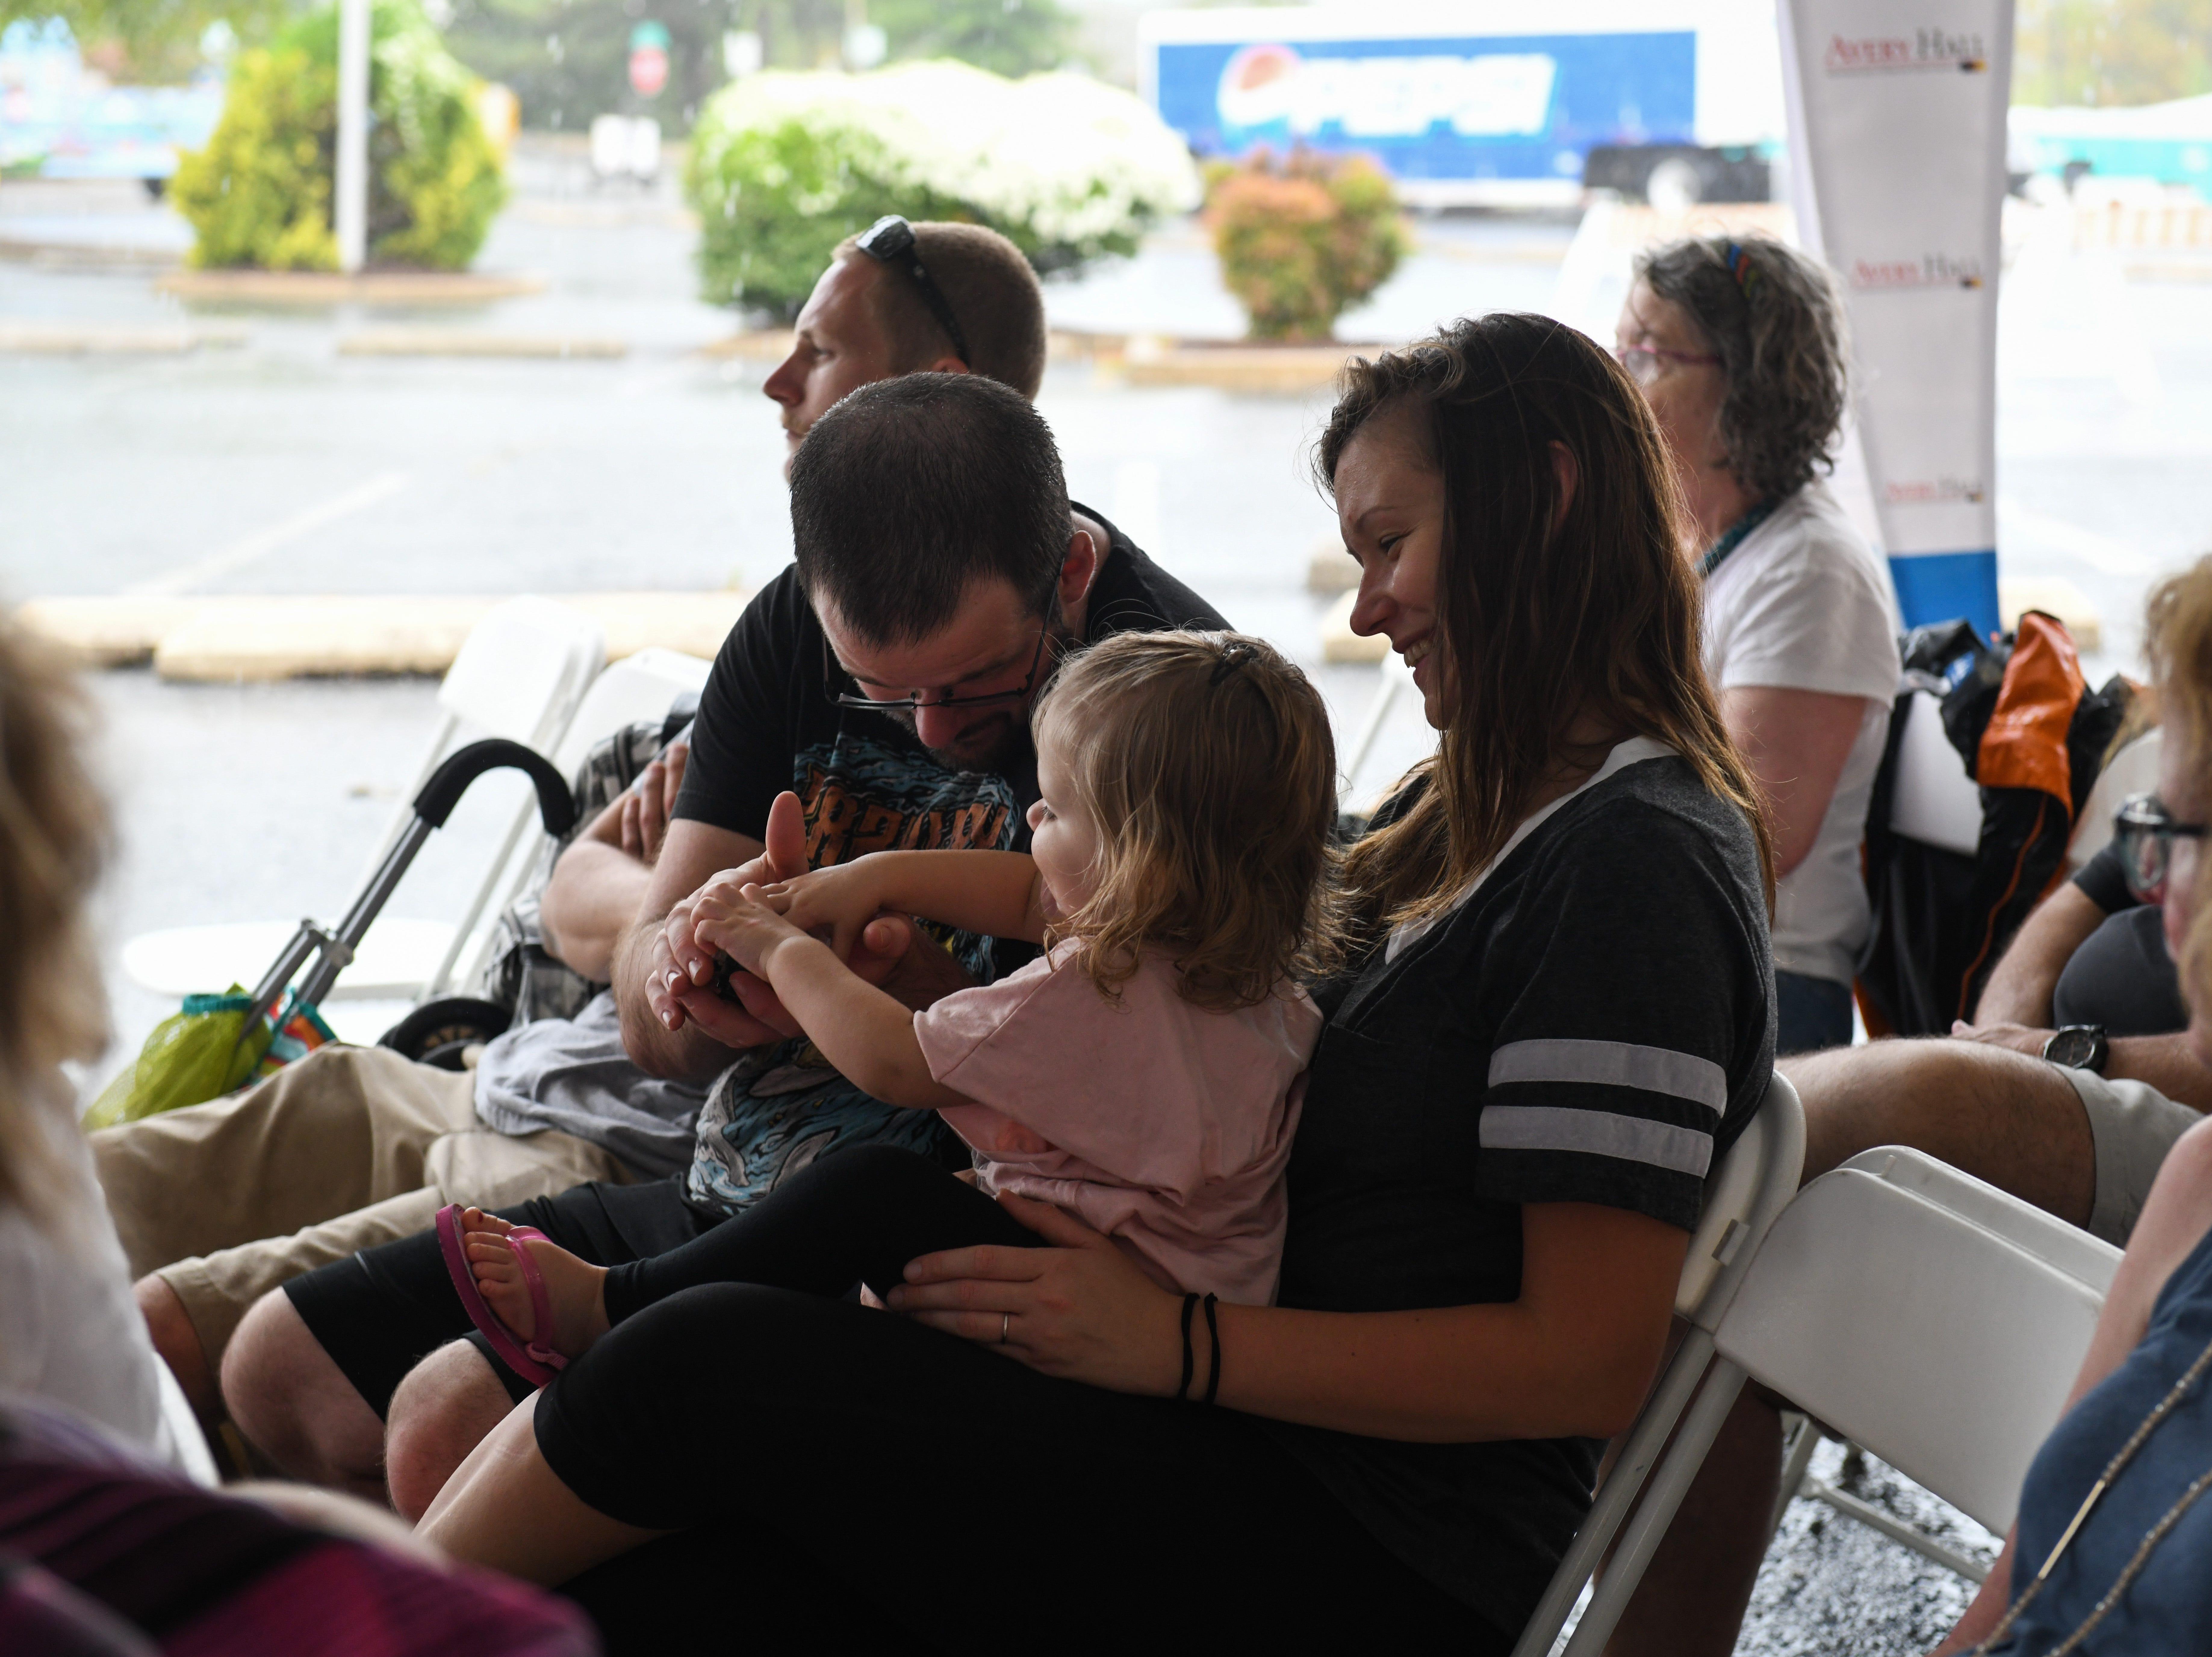 Rain didn't deter crowds at the National Folk Festival in Salisbury on Saturday, Sept. 8.